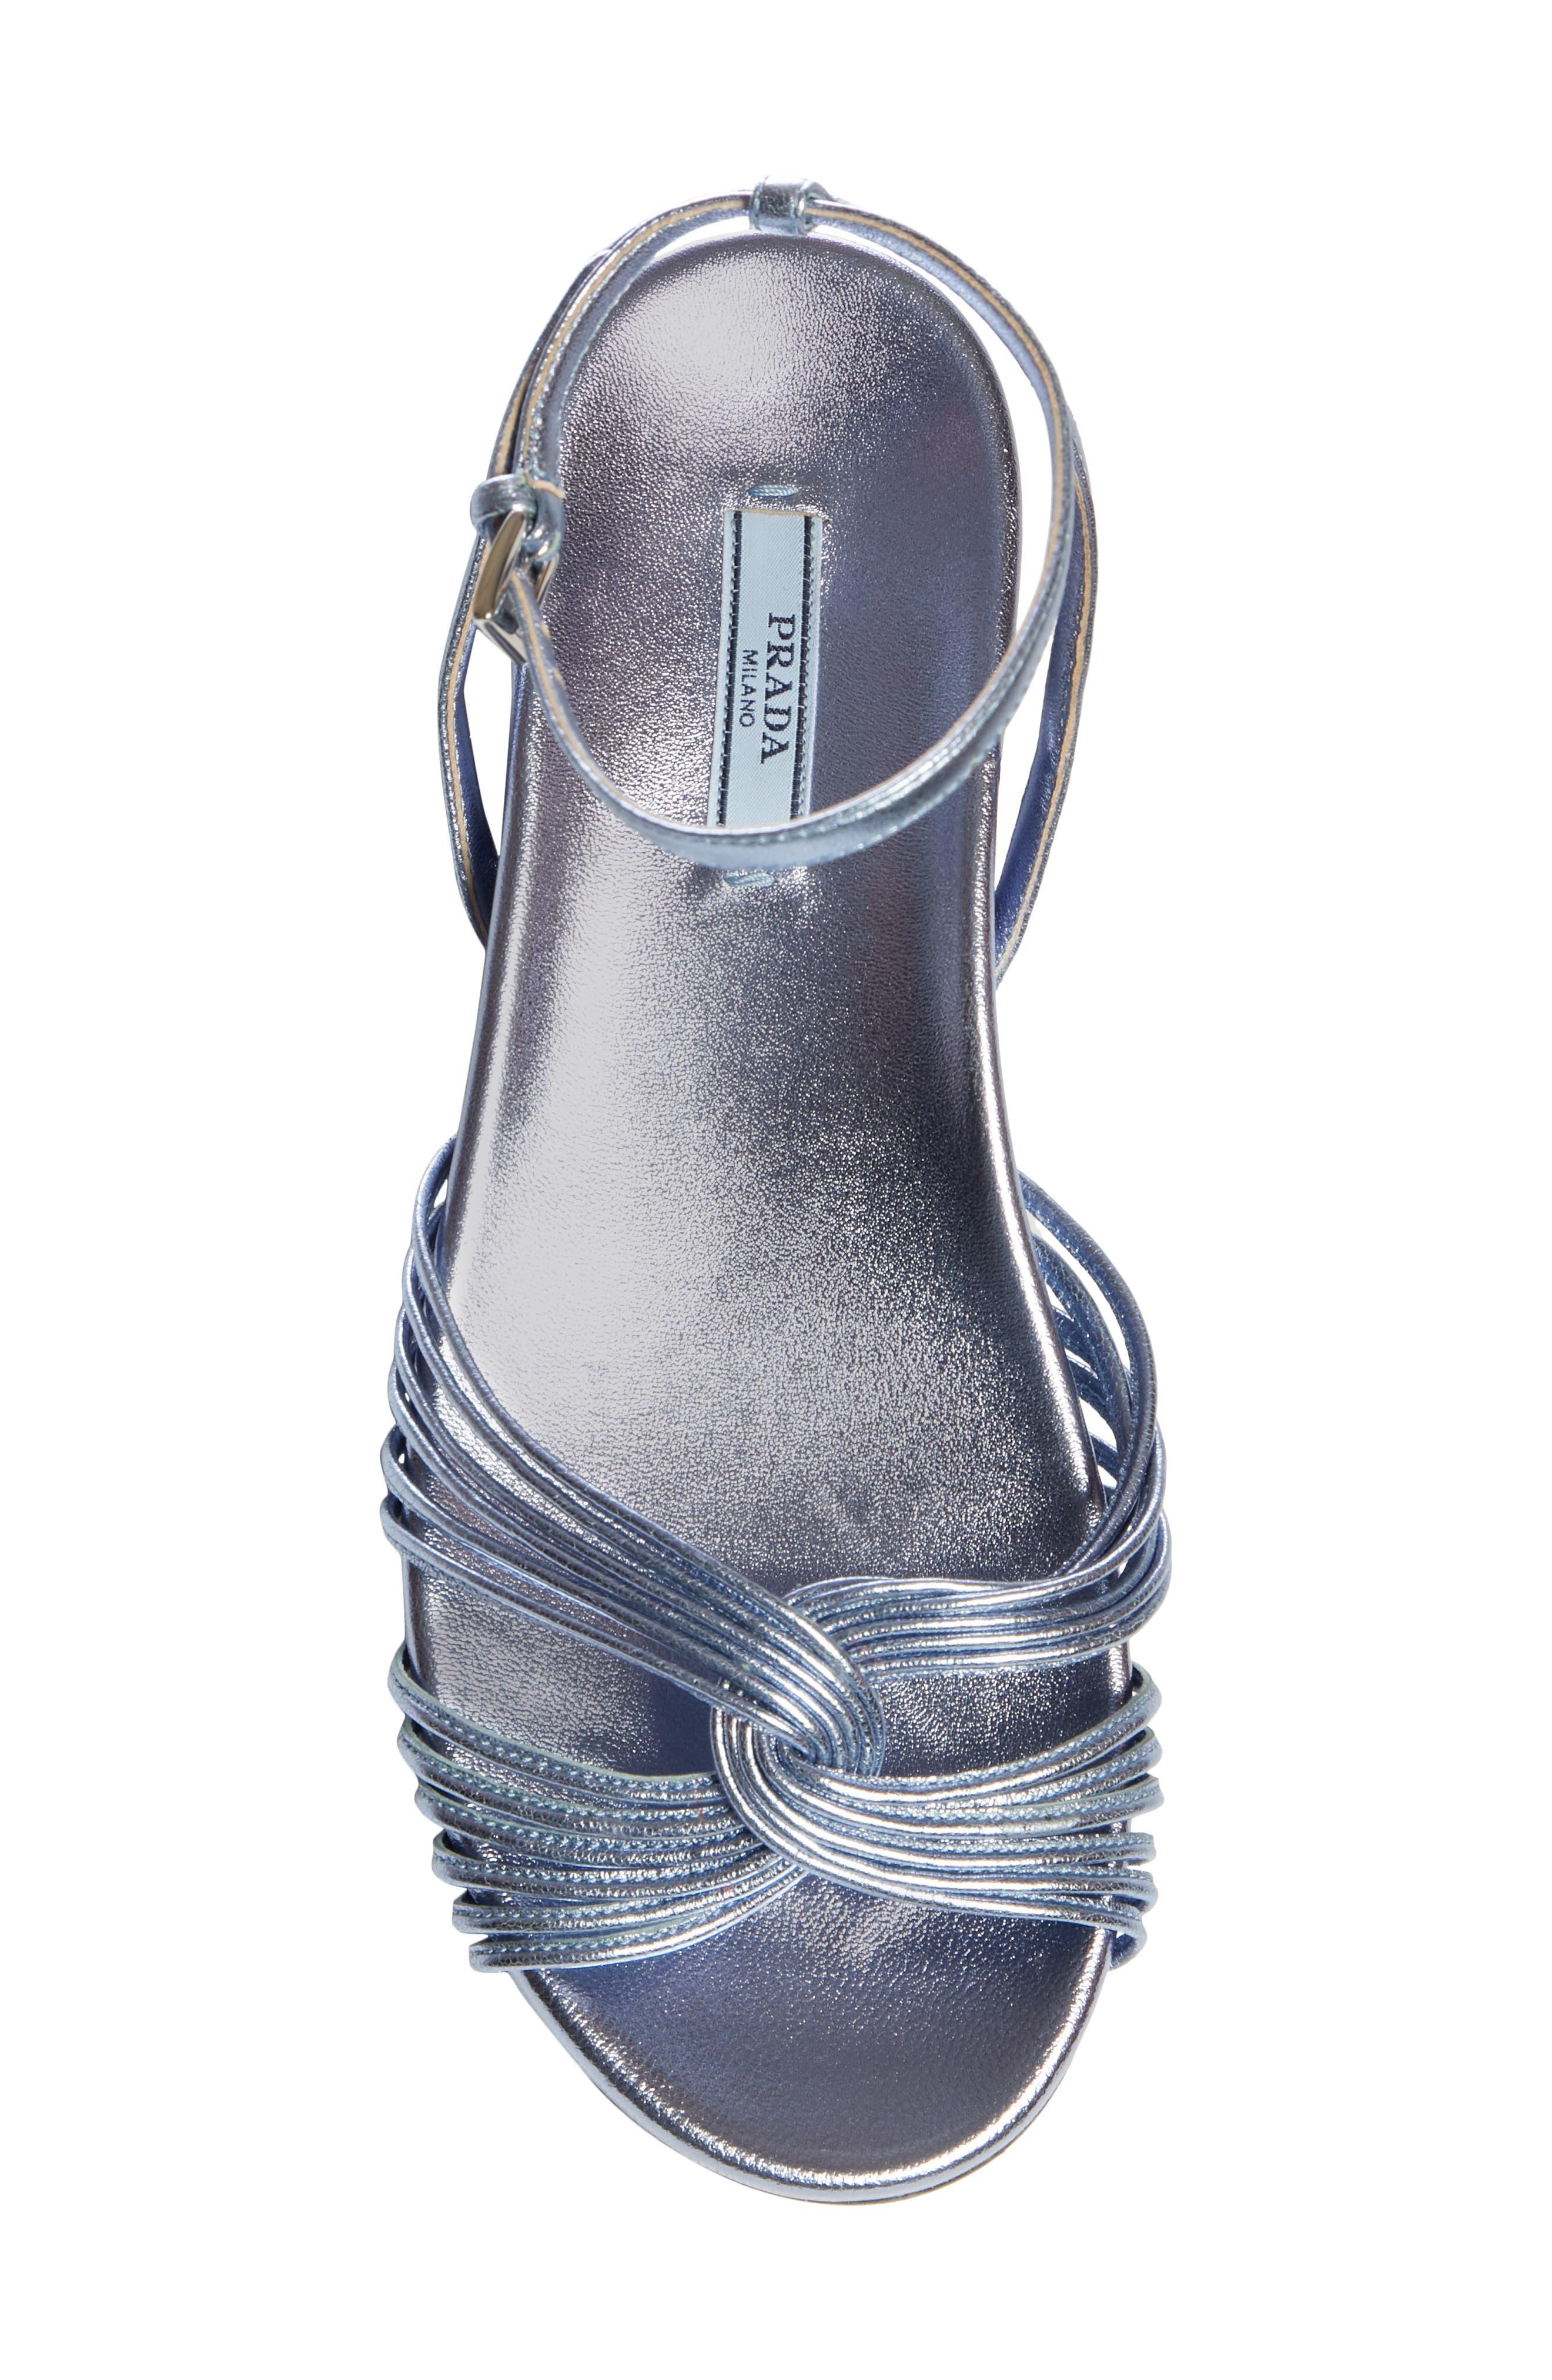 Roping Sandal,                             Alternate thumbnail 5, color,                             BLUE LEATHER